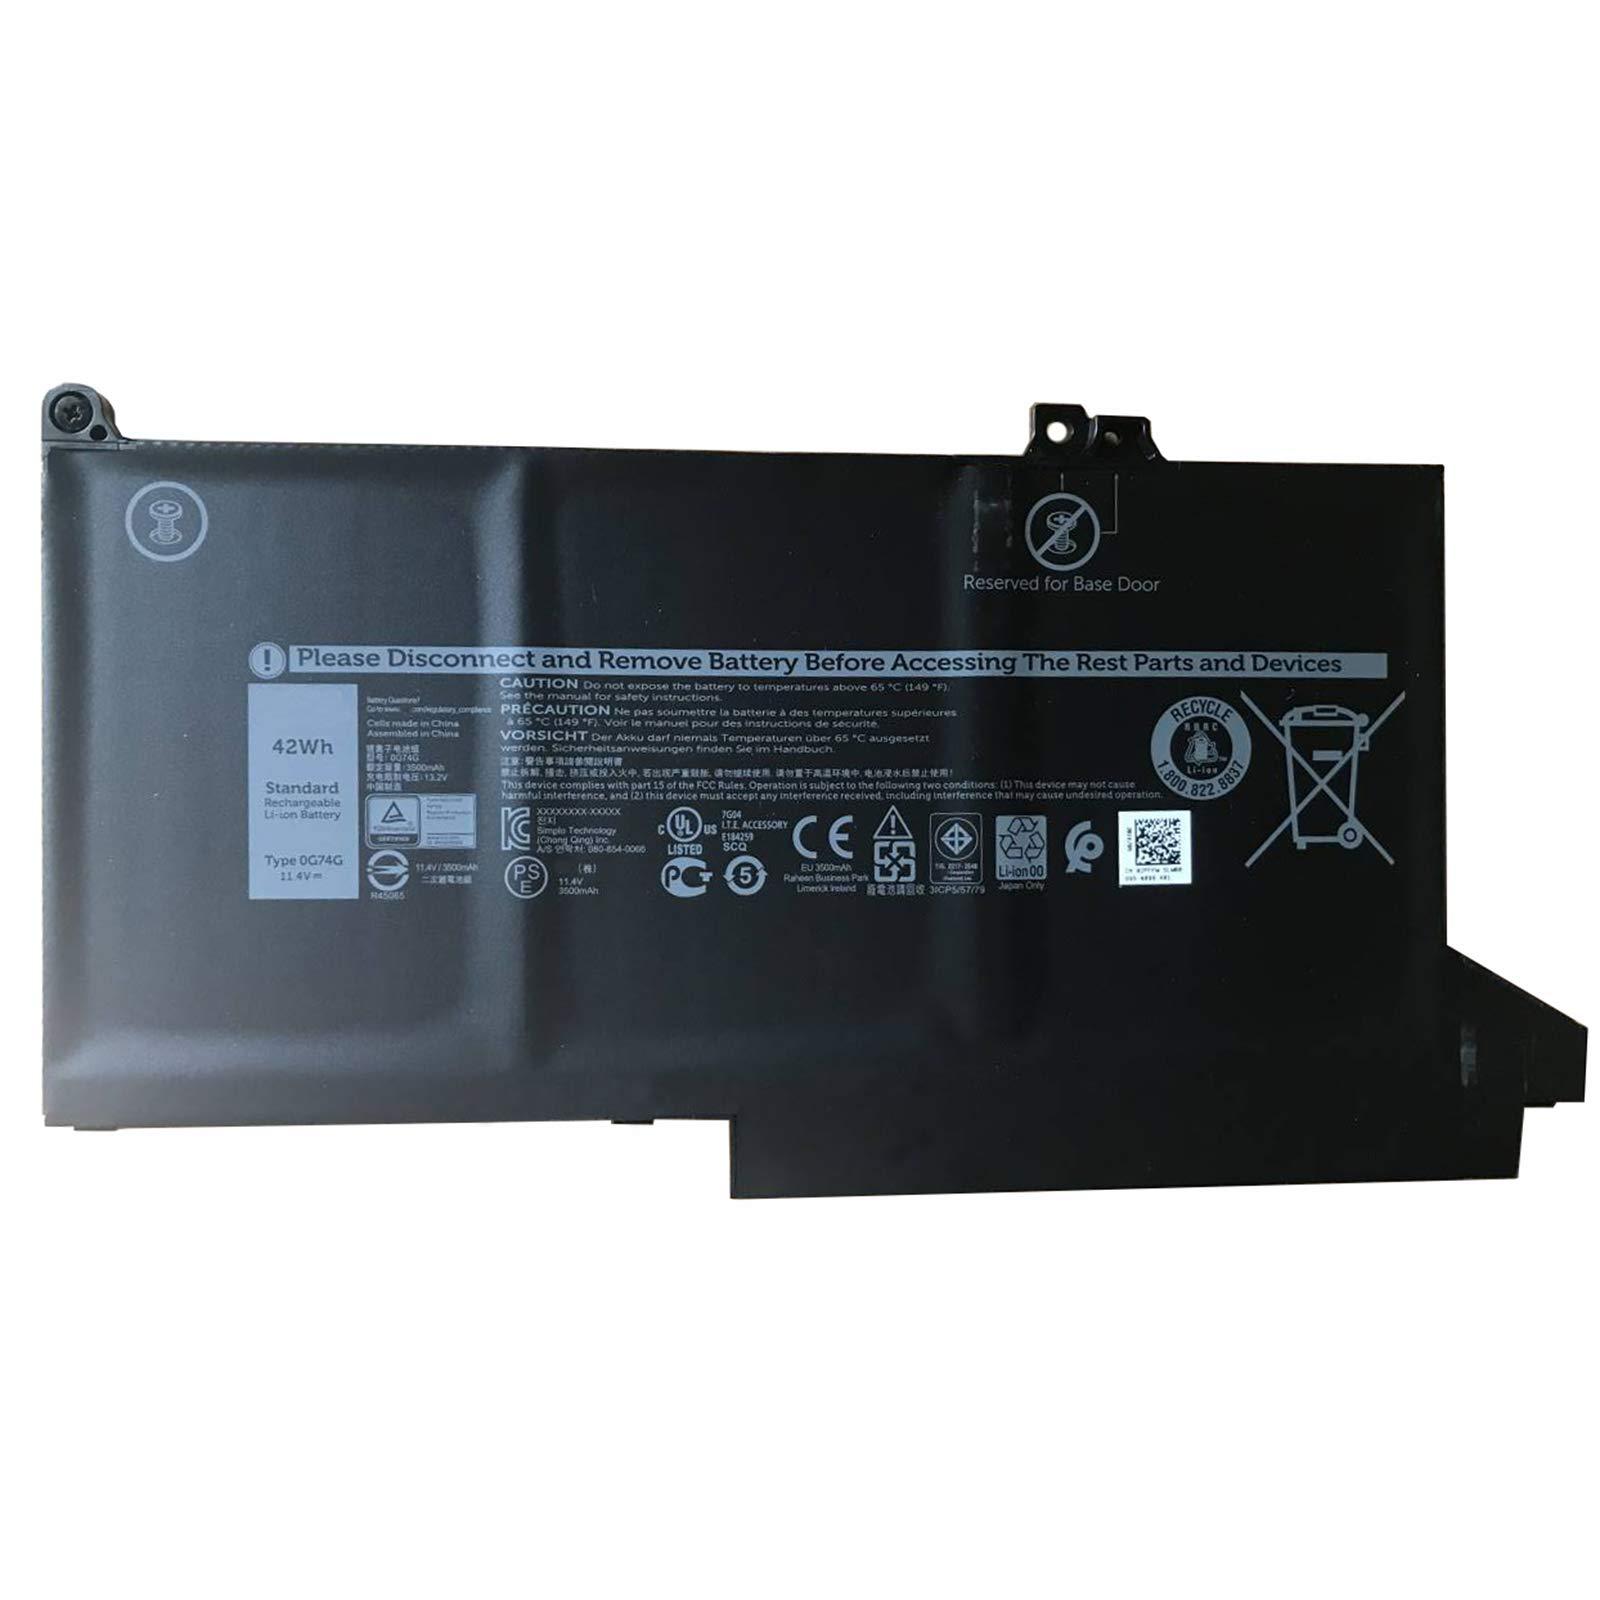 Bateria 11.4V 42Wh/3500mAh 0G74G Dell Latitude 13 5300 7300